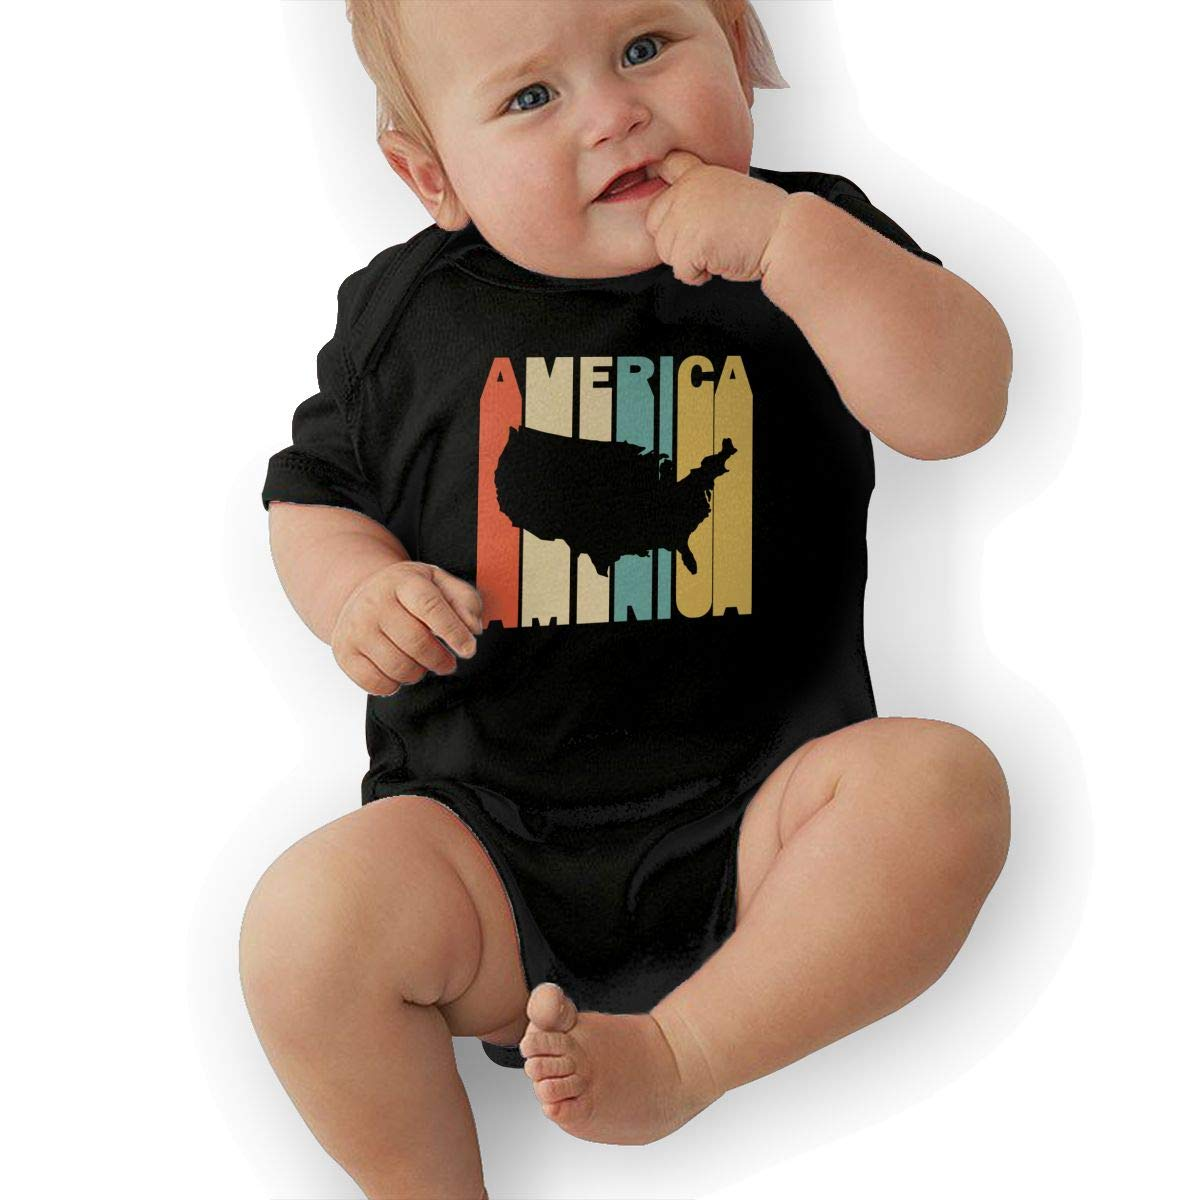 Short Sleeve Cotton Rompers for Baby Girls Boys Fashion Retro Style America Silhouette Sleepwear